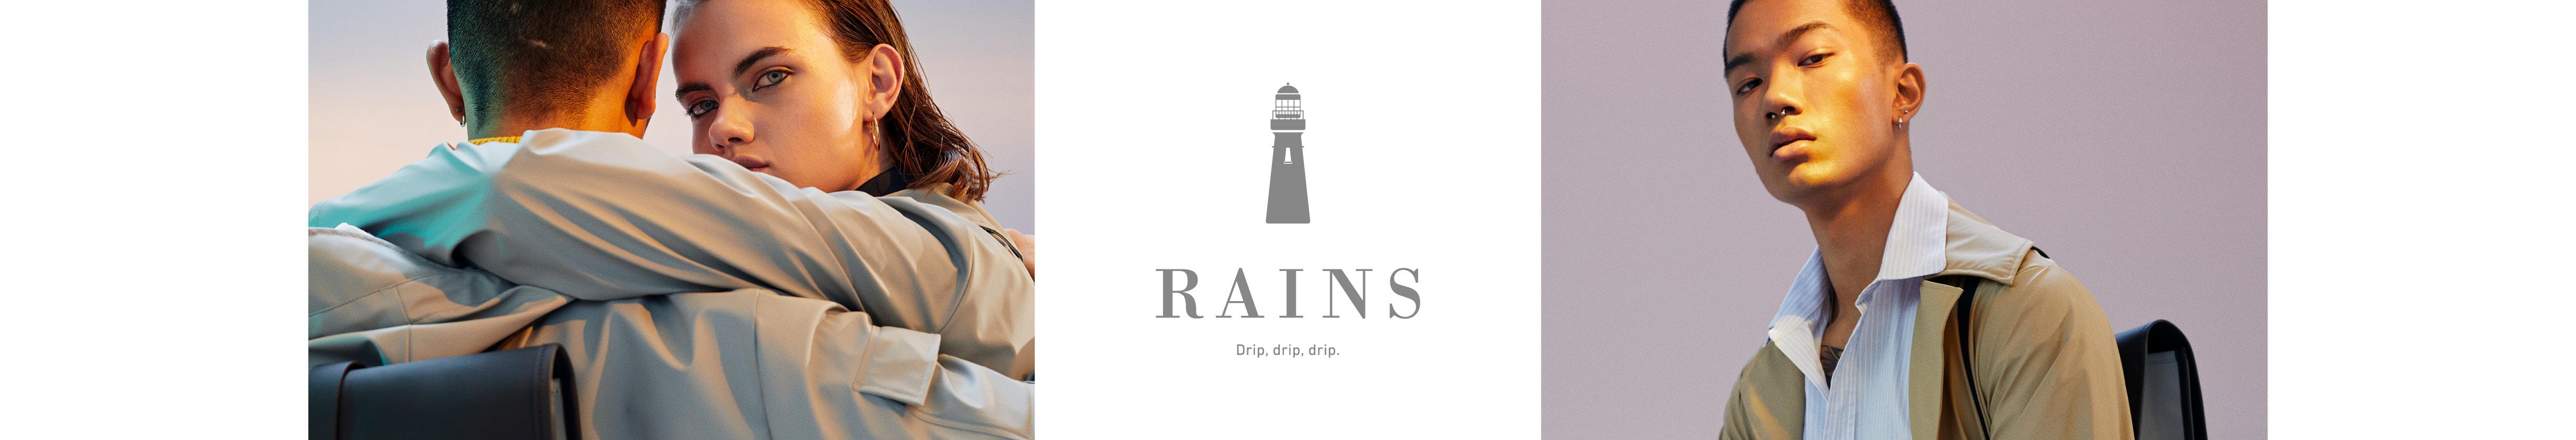 Rains_BrandWall_2340x400px